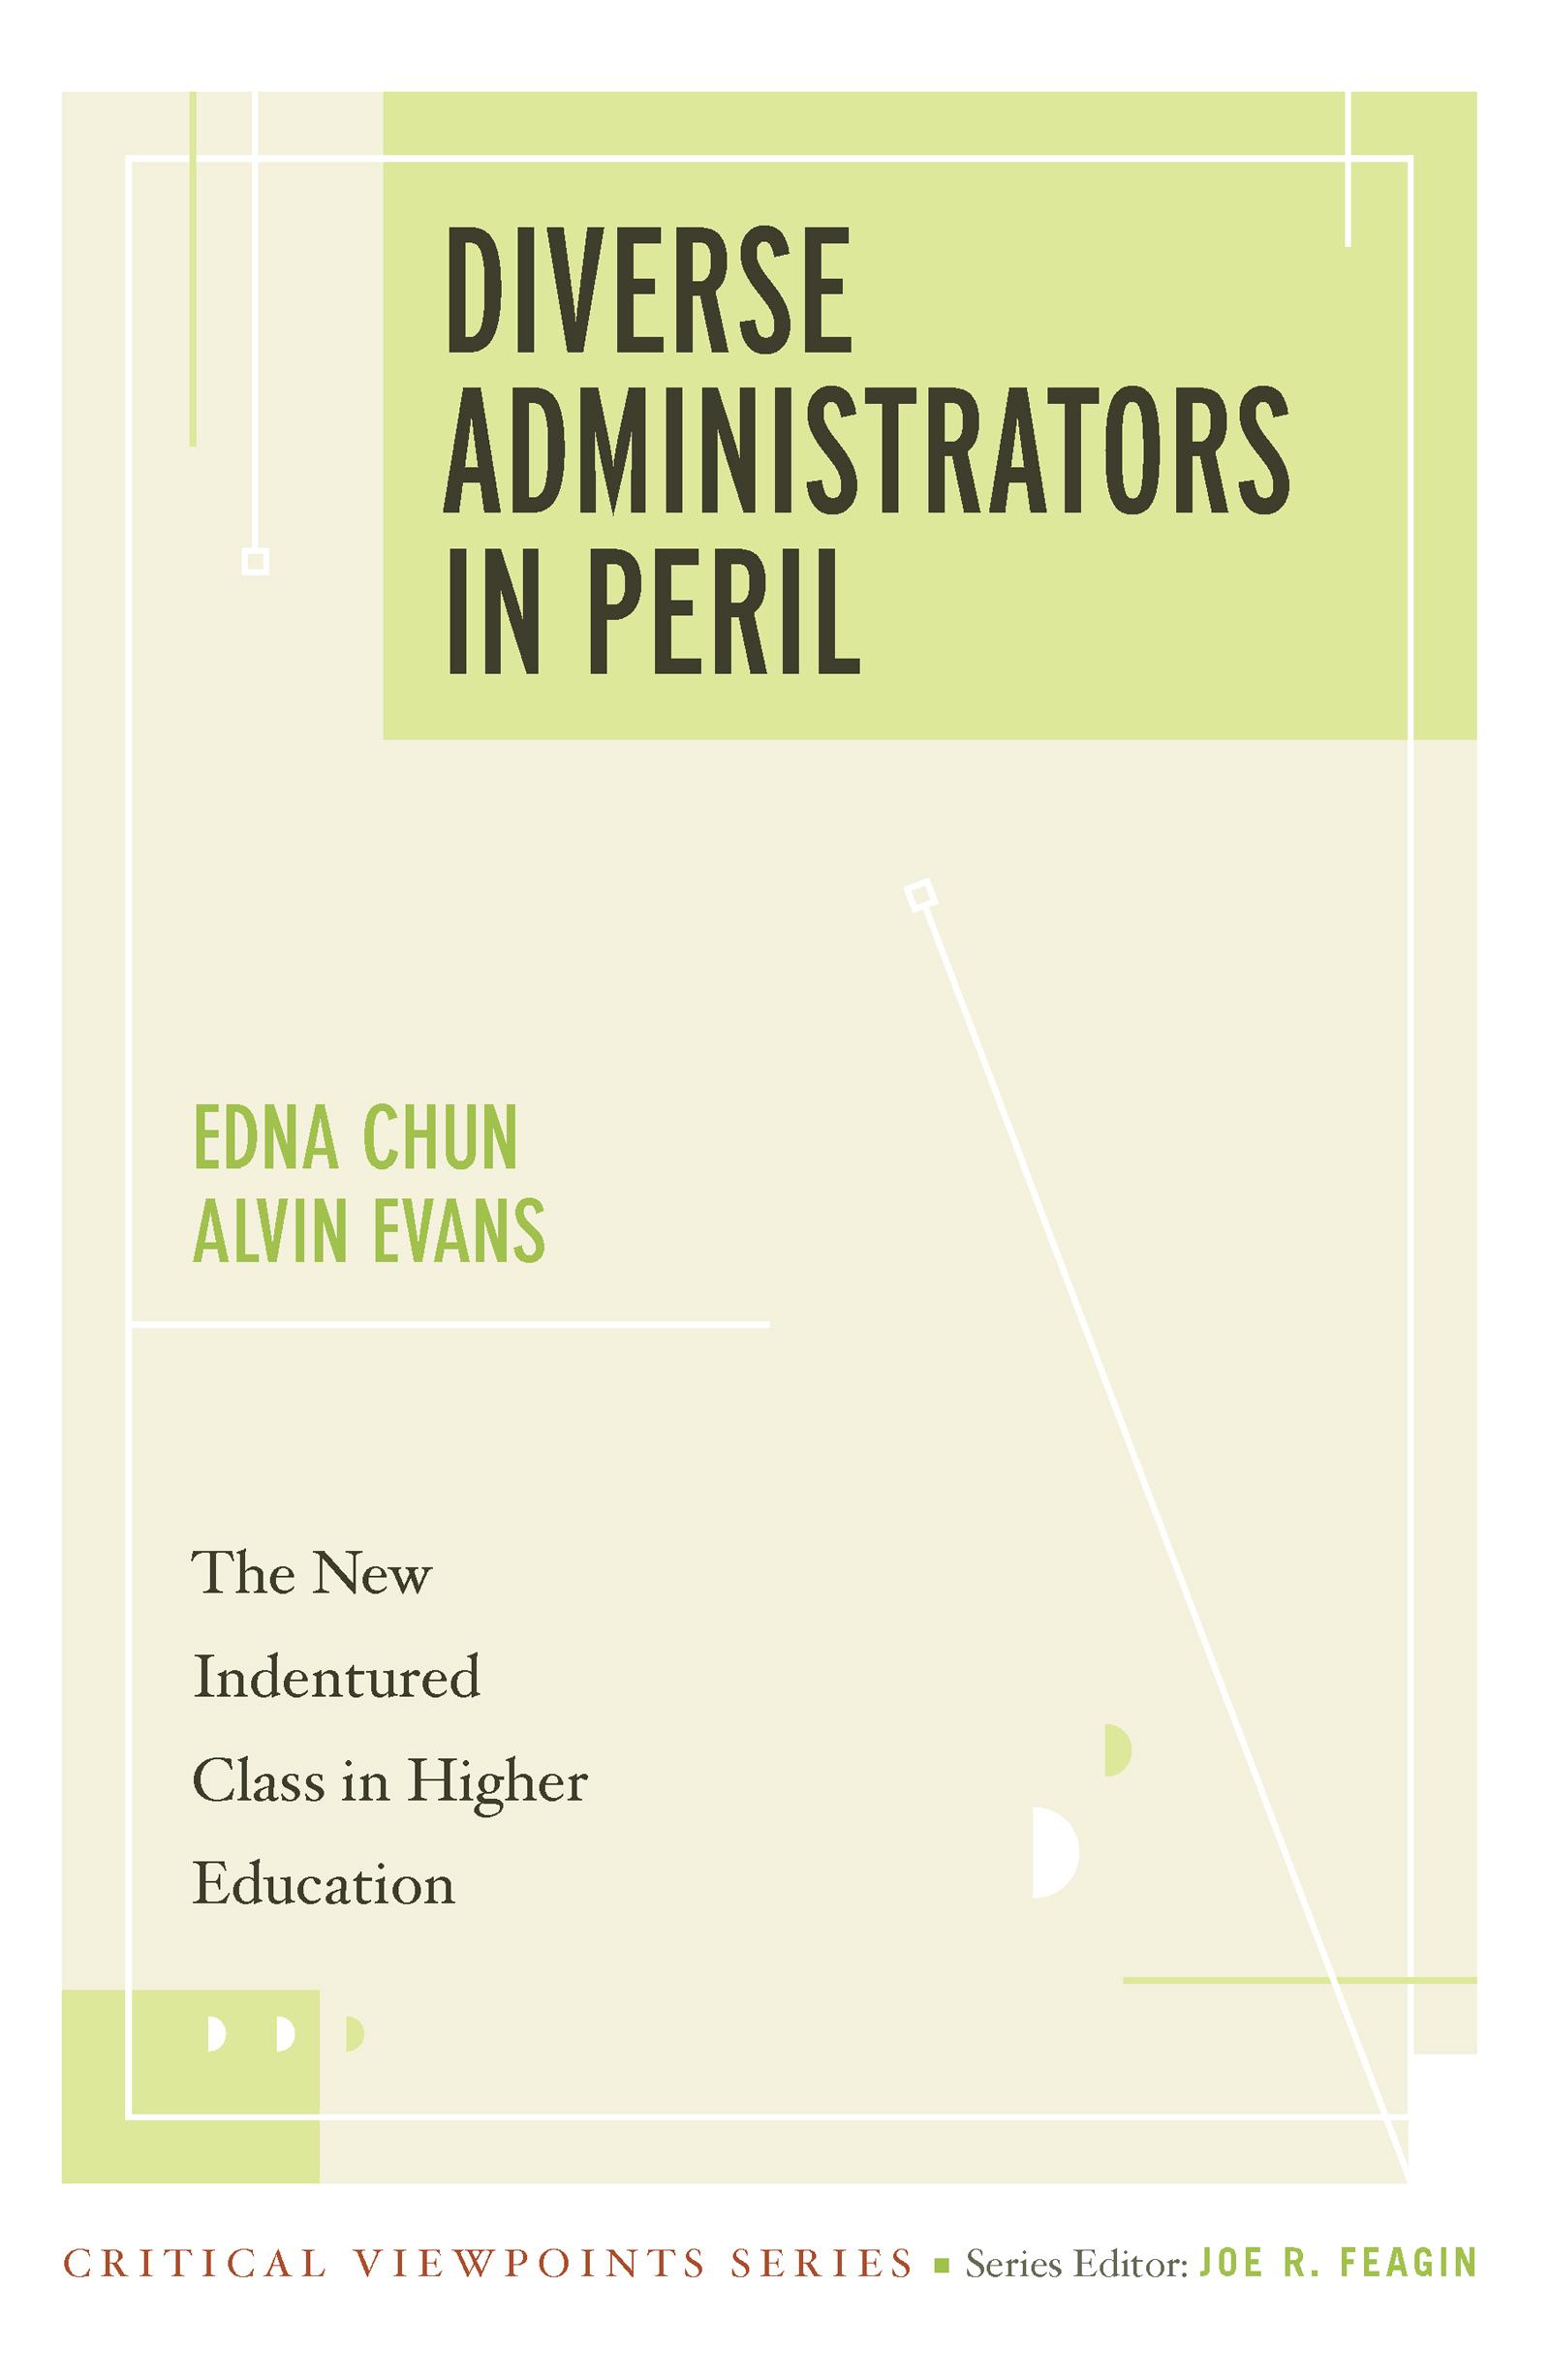 Diverse Administrators in Peril